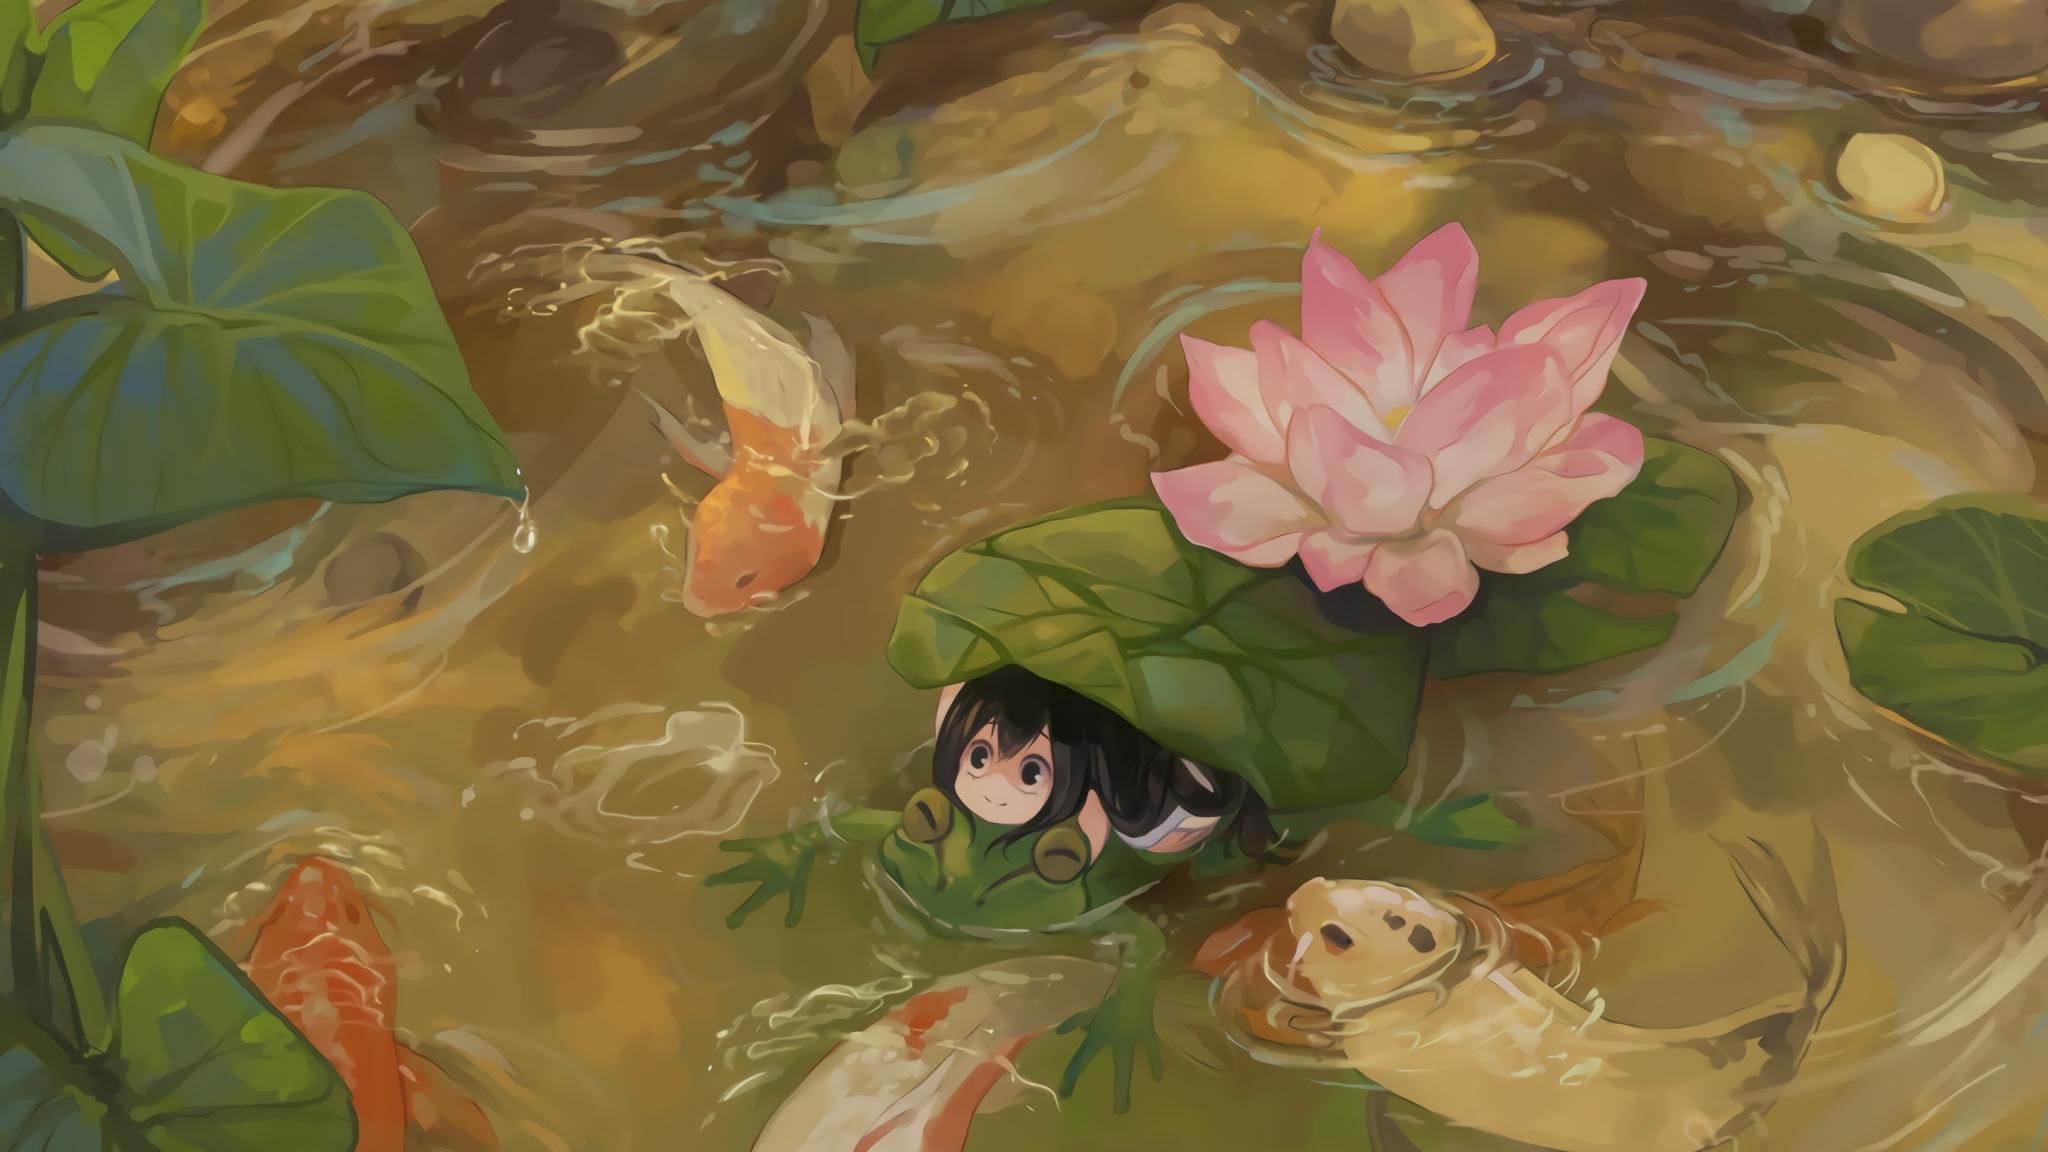 Download 2048x1152 Wallpaper Tsuyu Asui In Lake, Anime ...